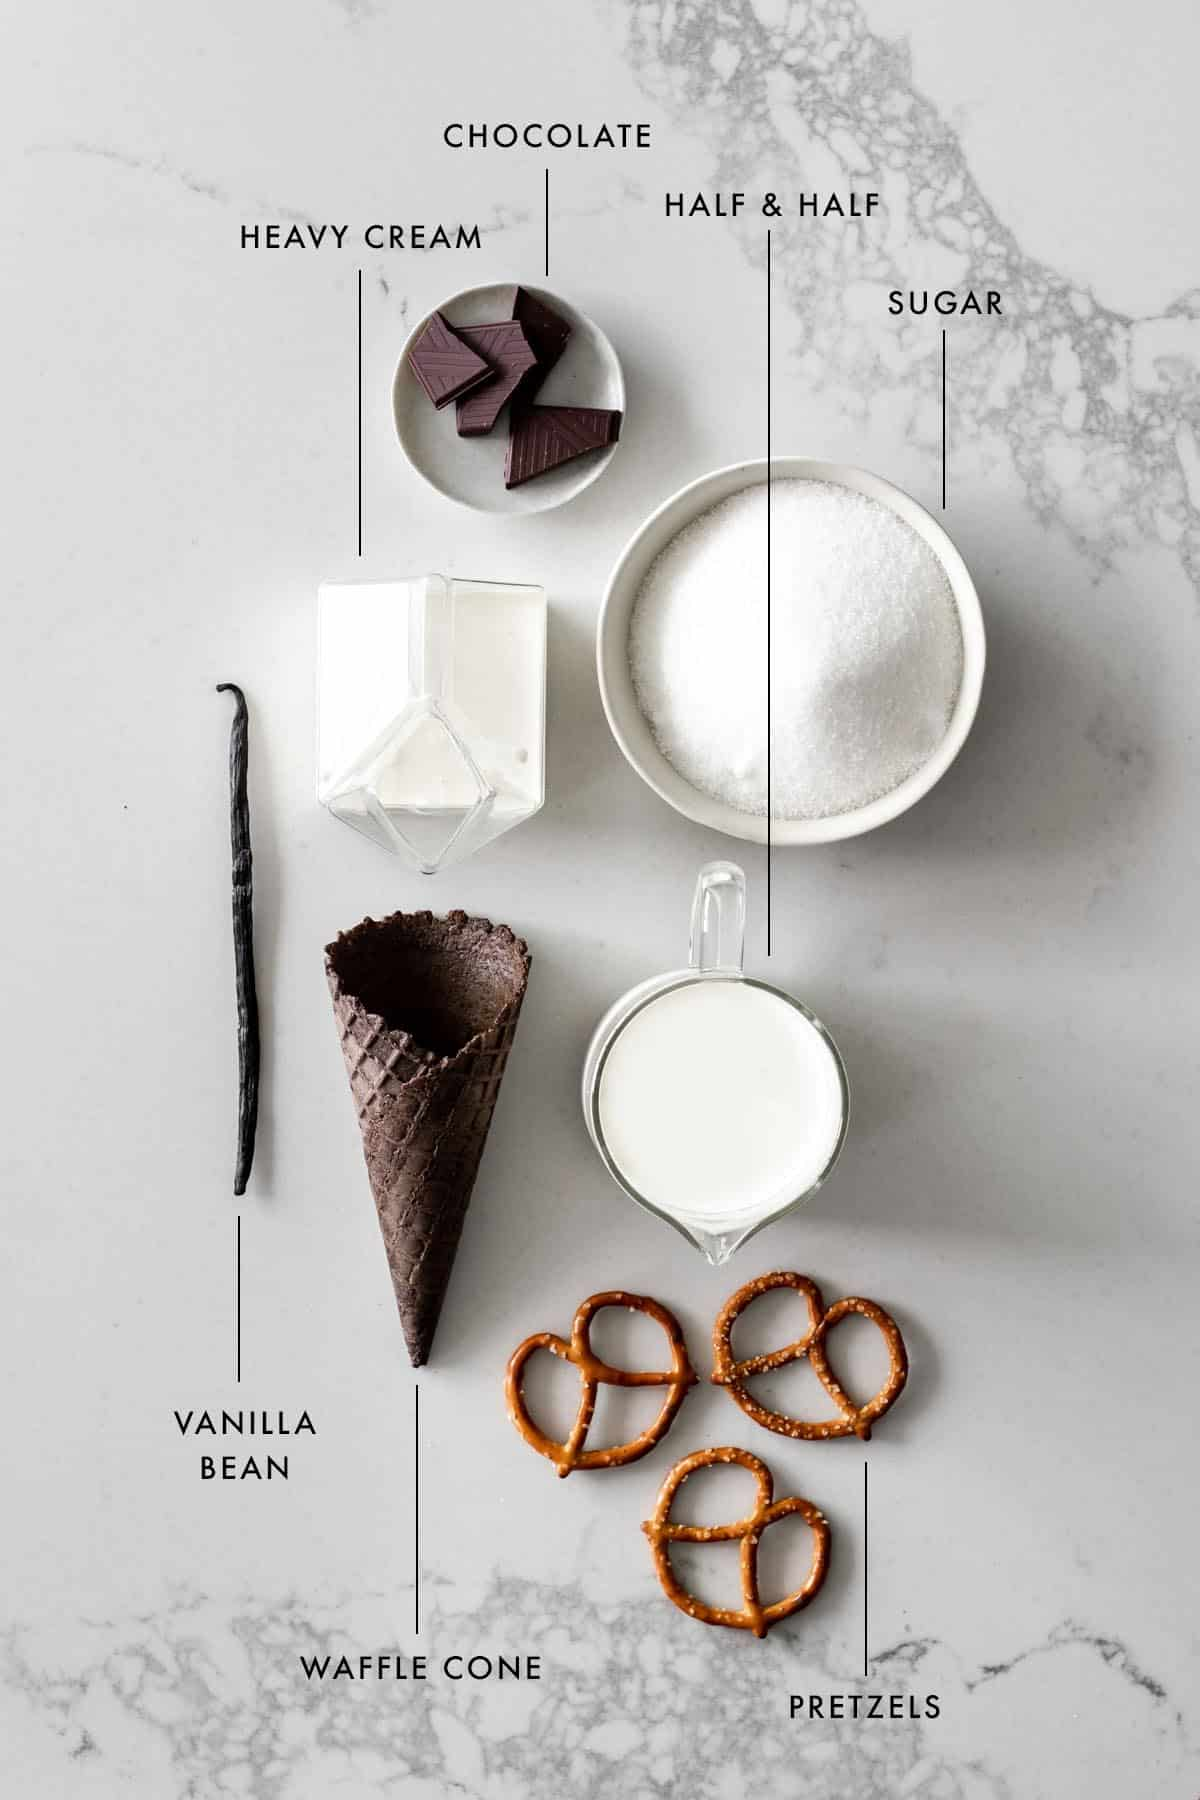 Flat lay of heavy cream, chocolate, half and half, sugar, vanilla bean, waffle cone, and pretzels.